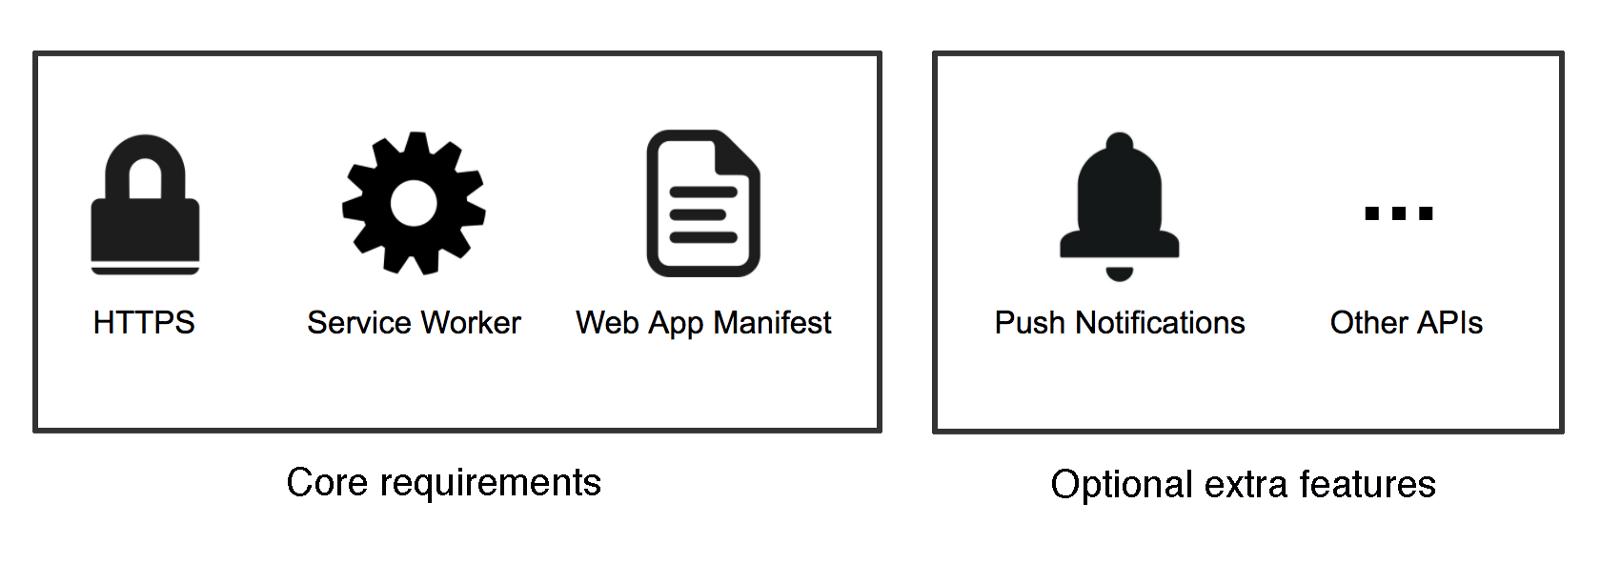 iOS 终于支持了 PWA,一起来认识一下这个强化版「小程序」 | 科普